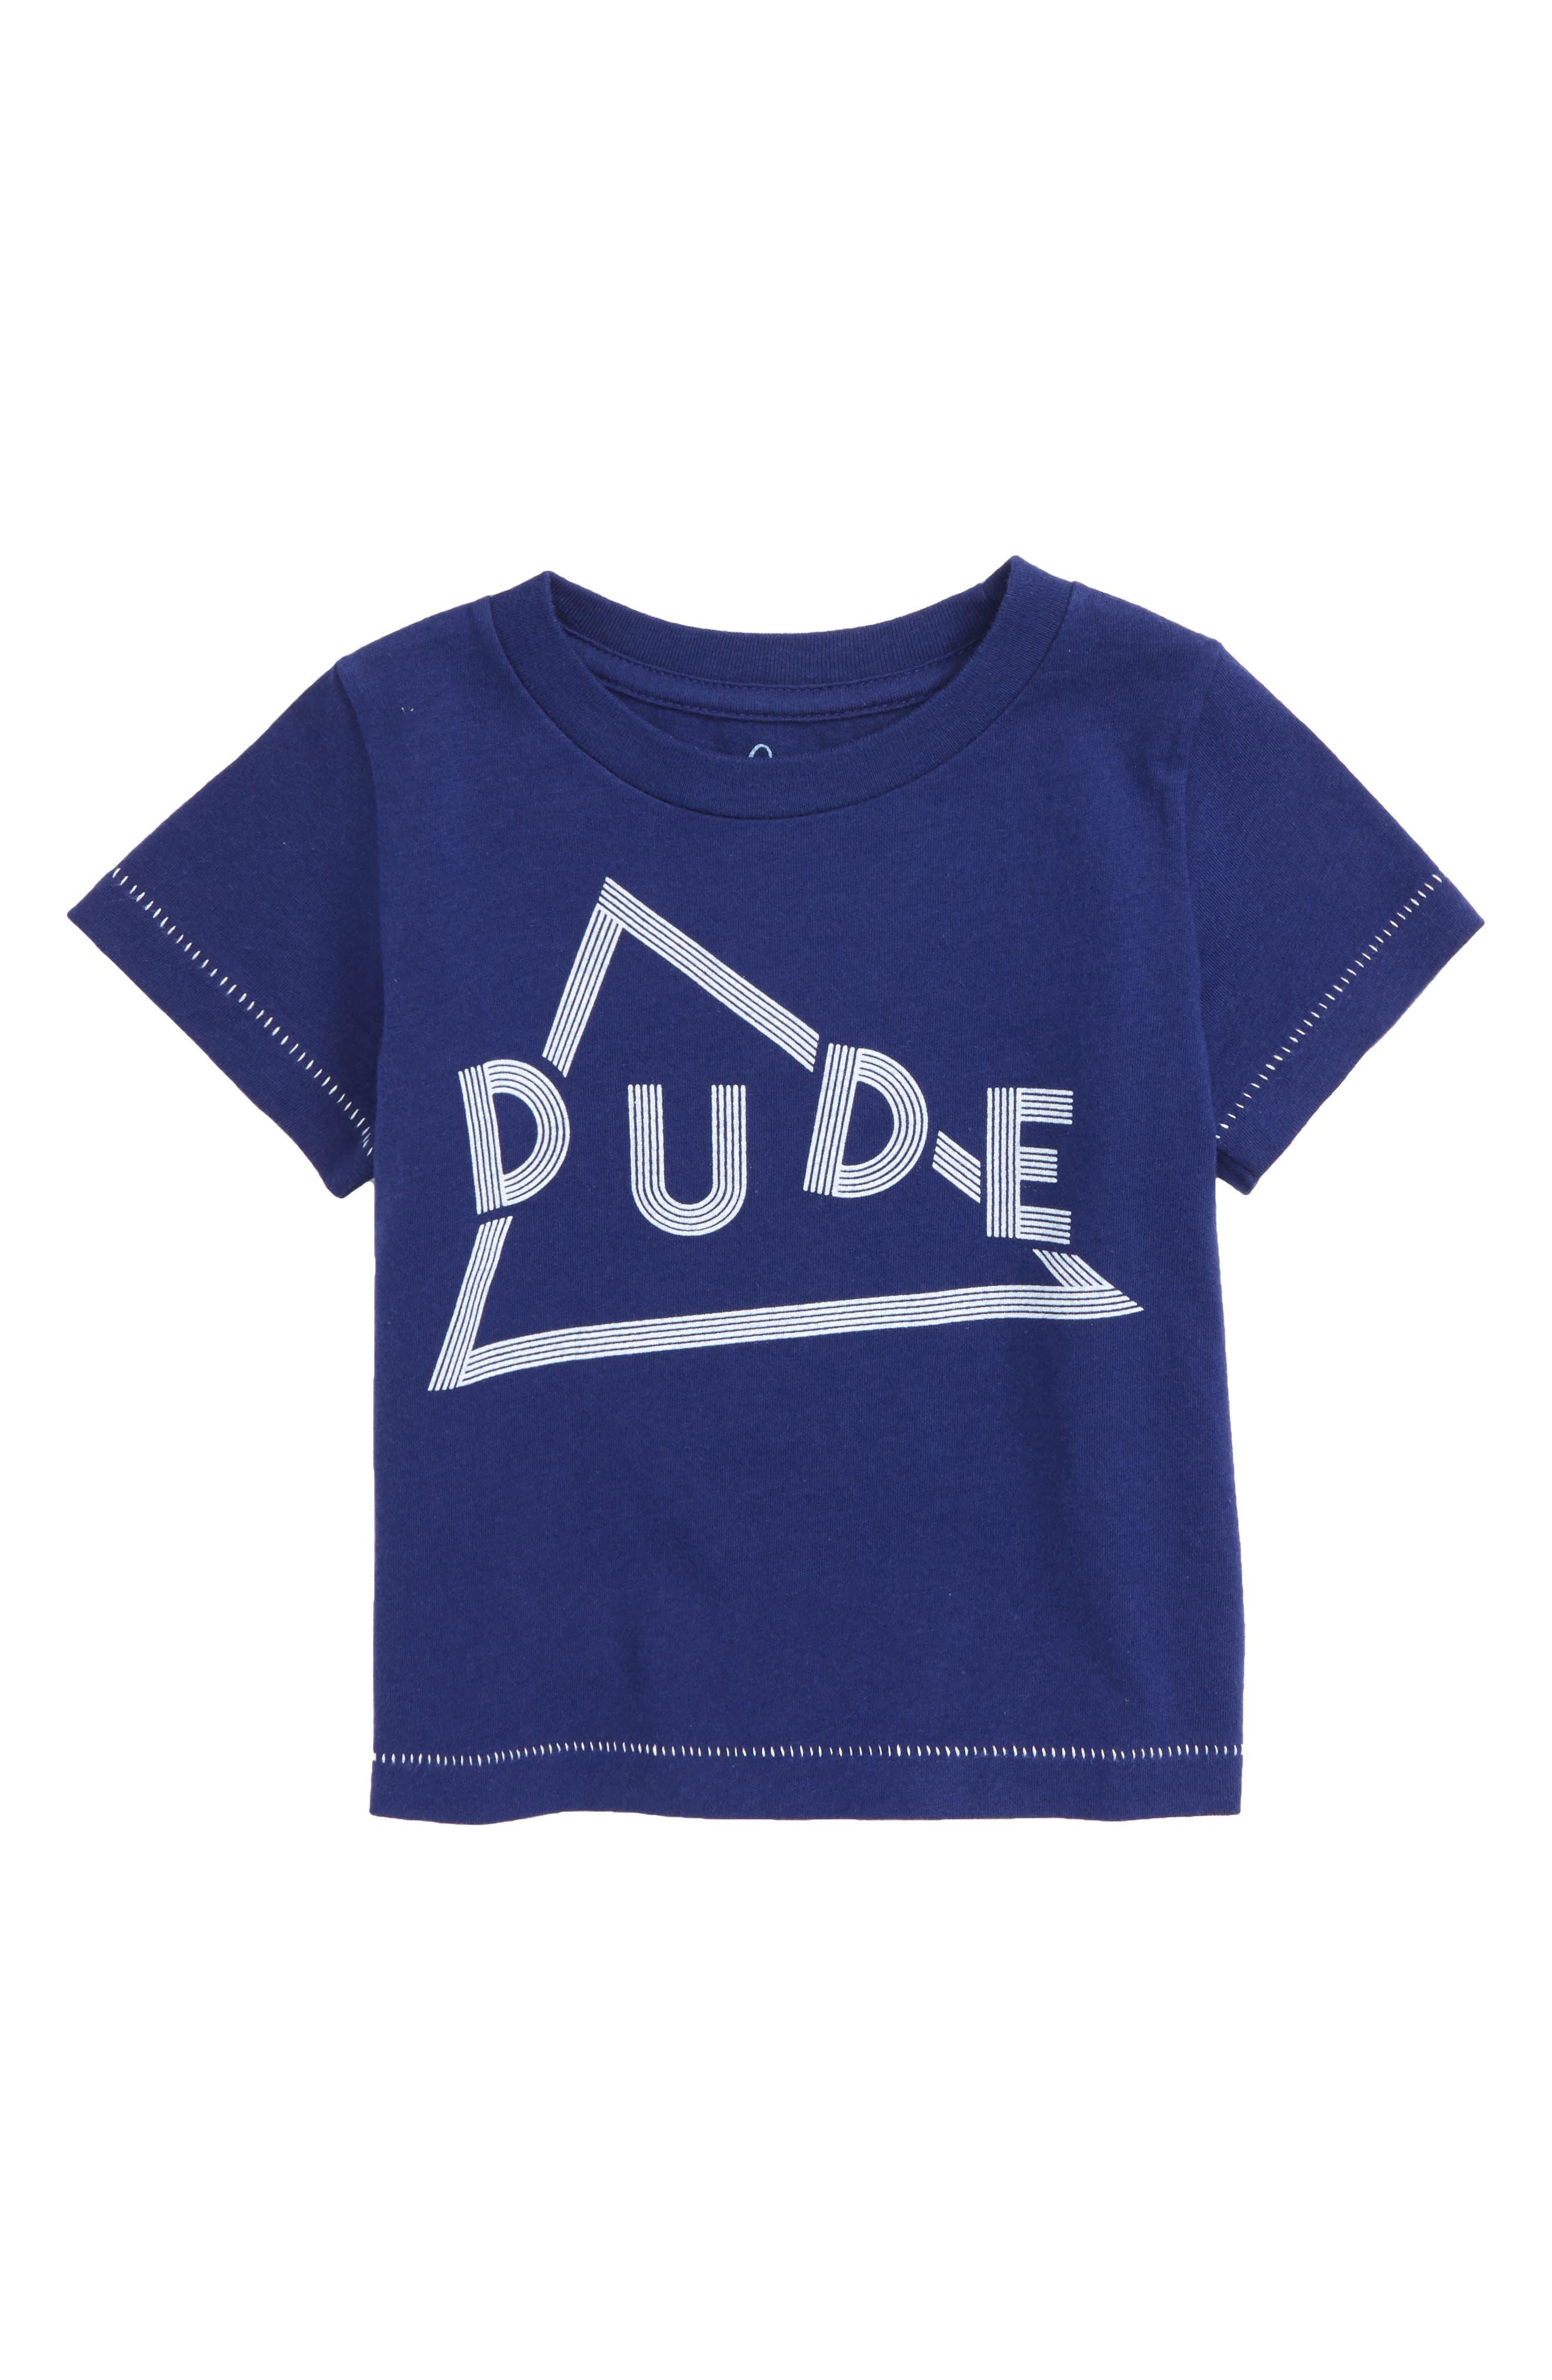 Dude Graphic T-Shirt,                             Main thumbnail 1, color,                             410